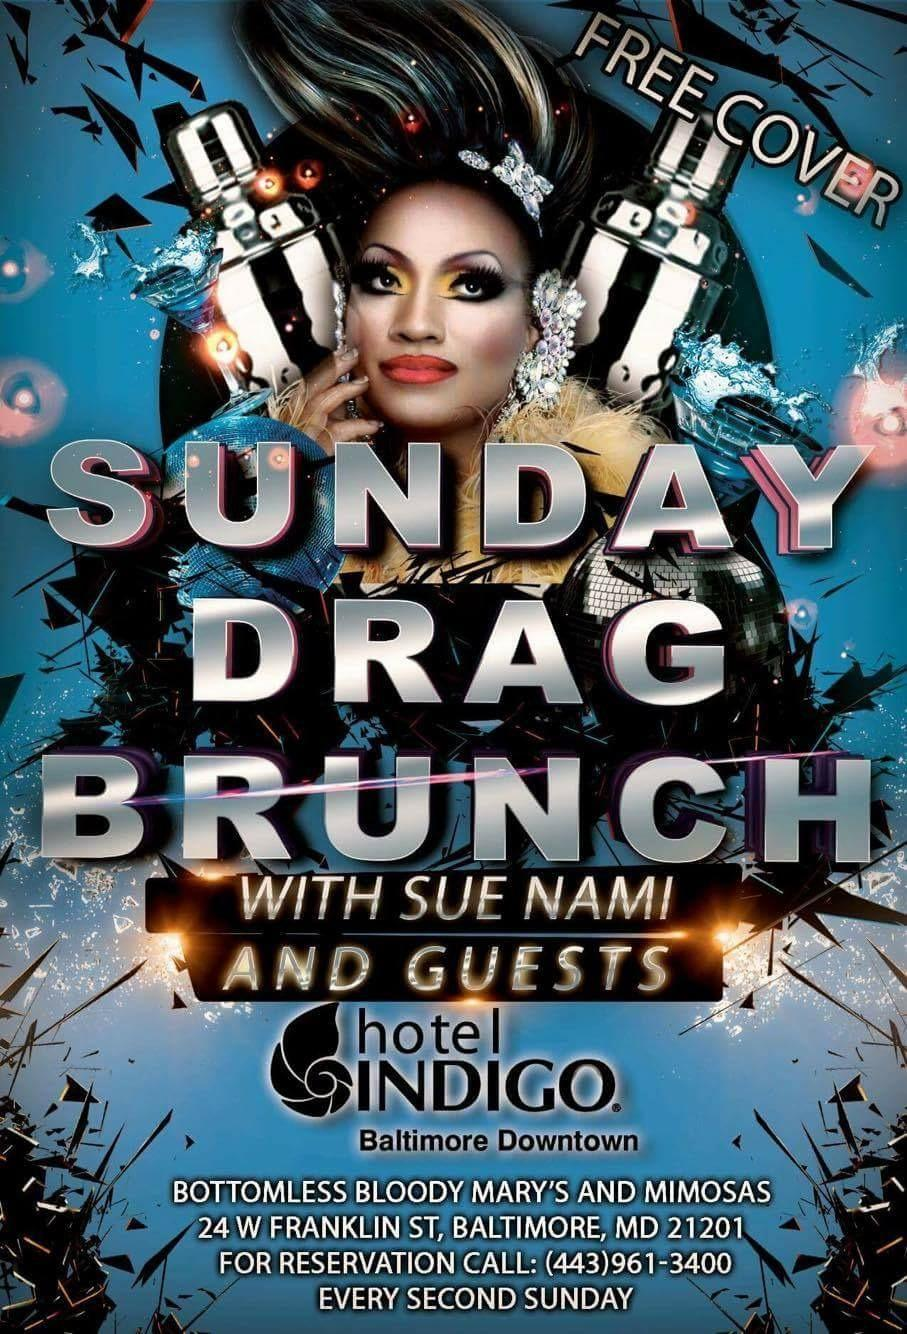 Second Sunday Drag Brunch @ Hotel Indigo Baltimore